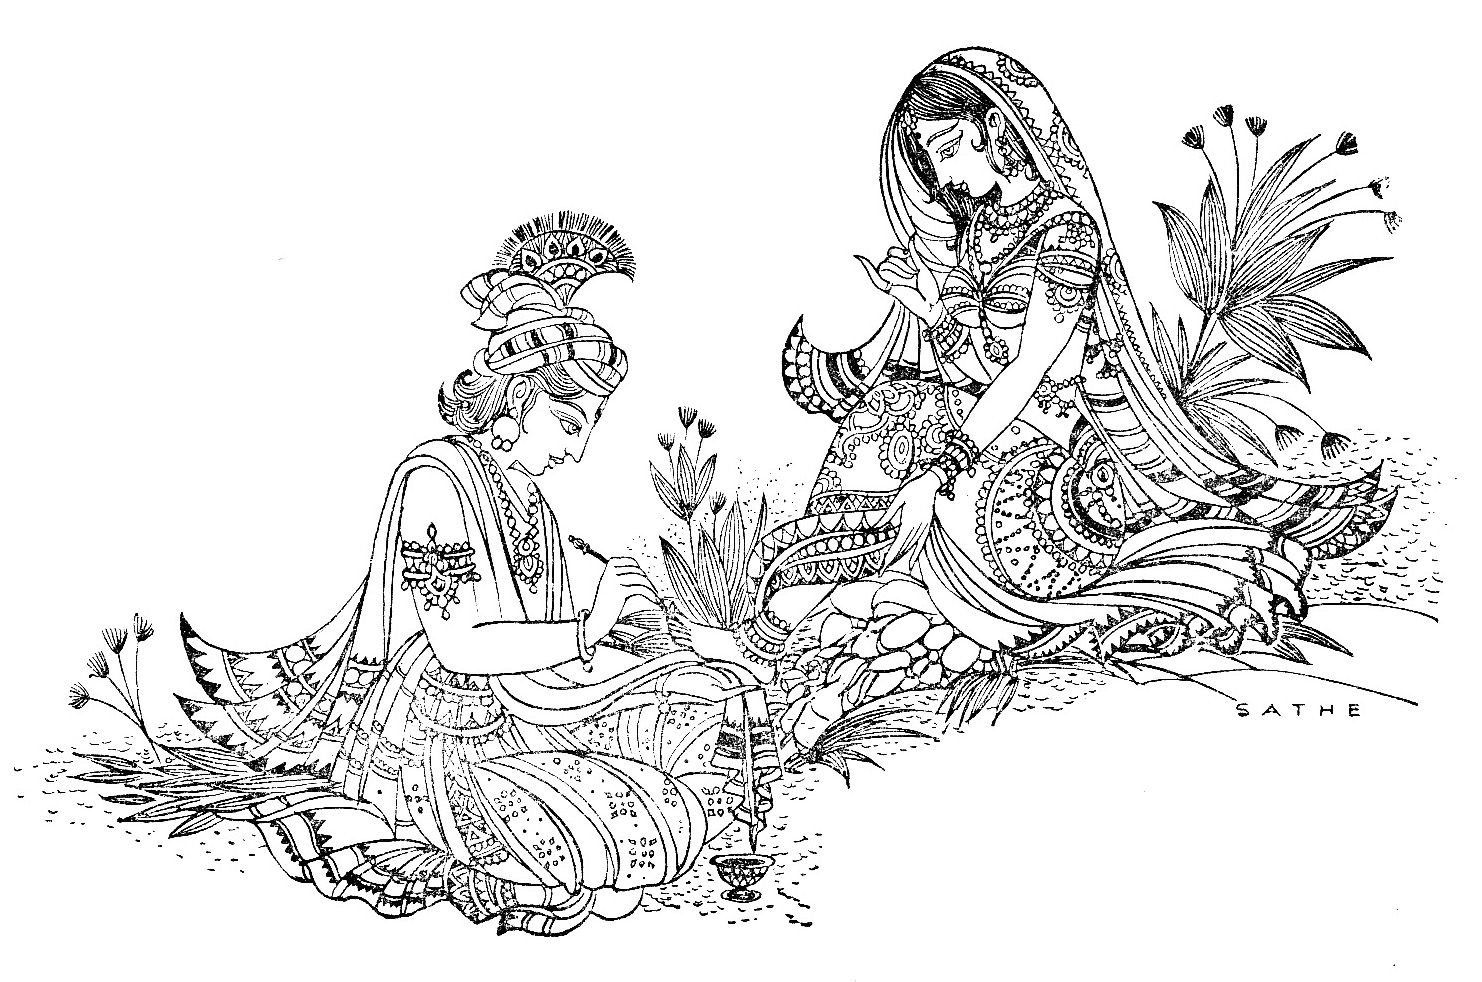 black and white pictures of radha krishna - Google Search | rasikas ...